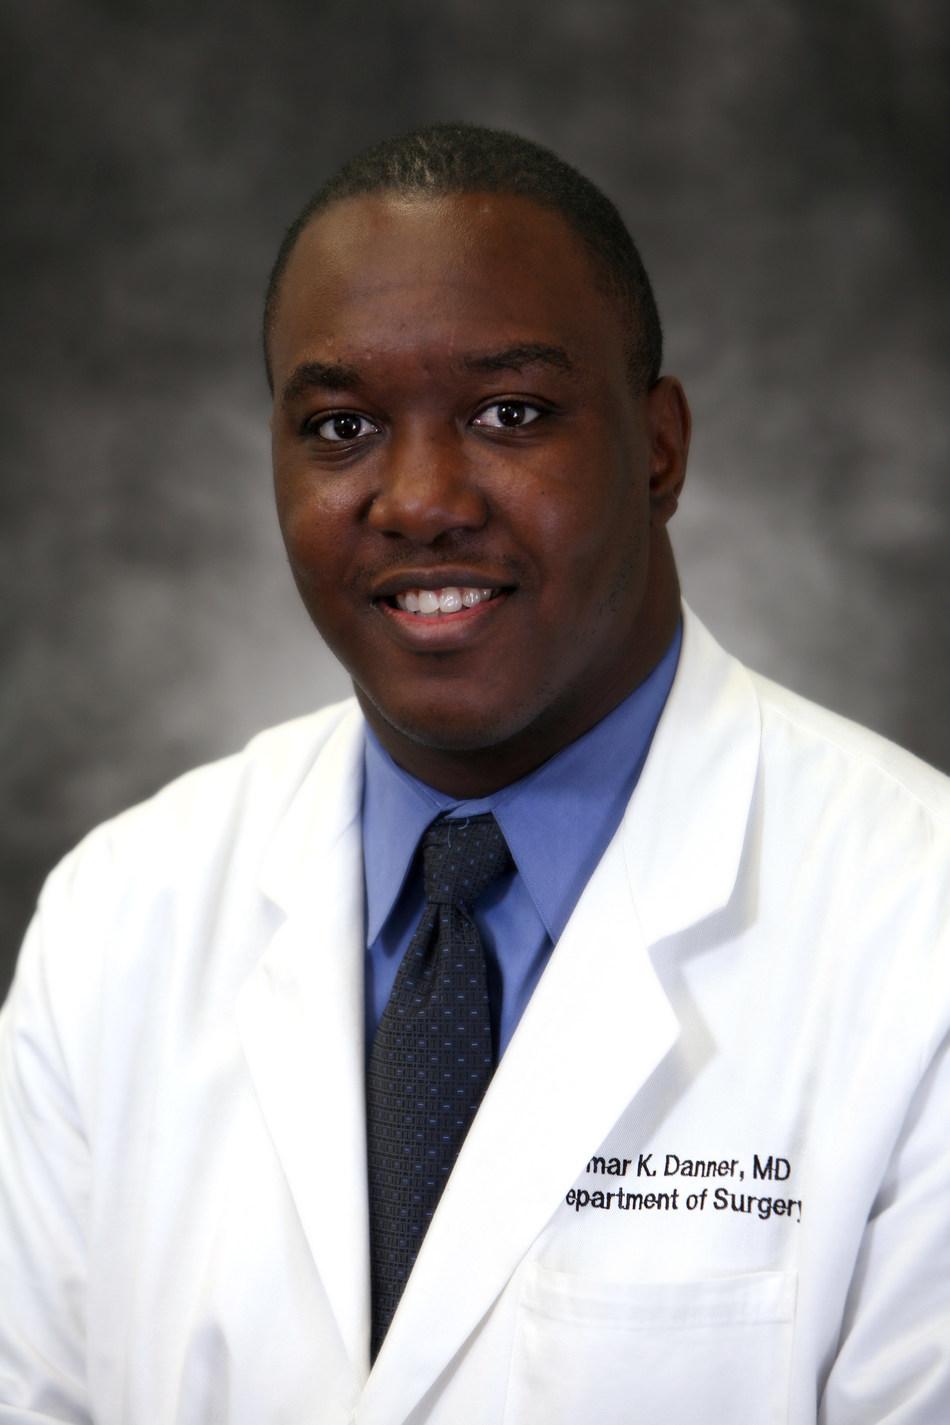 Omar Danner, M.D., FACS, associate professor and director of trauma, critical care and advanced laparoscopy for MSM at Grady Memorial Hospital in Atlanta.